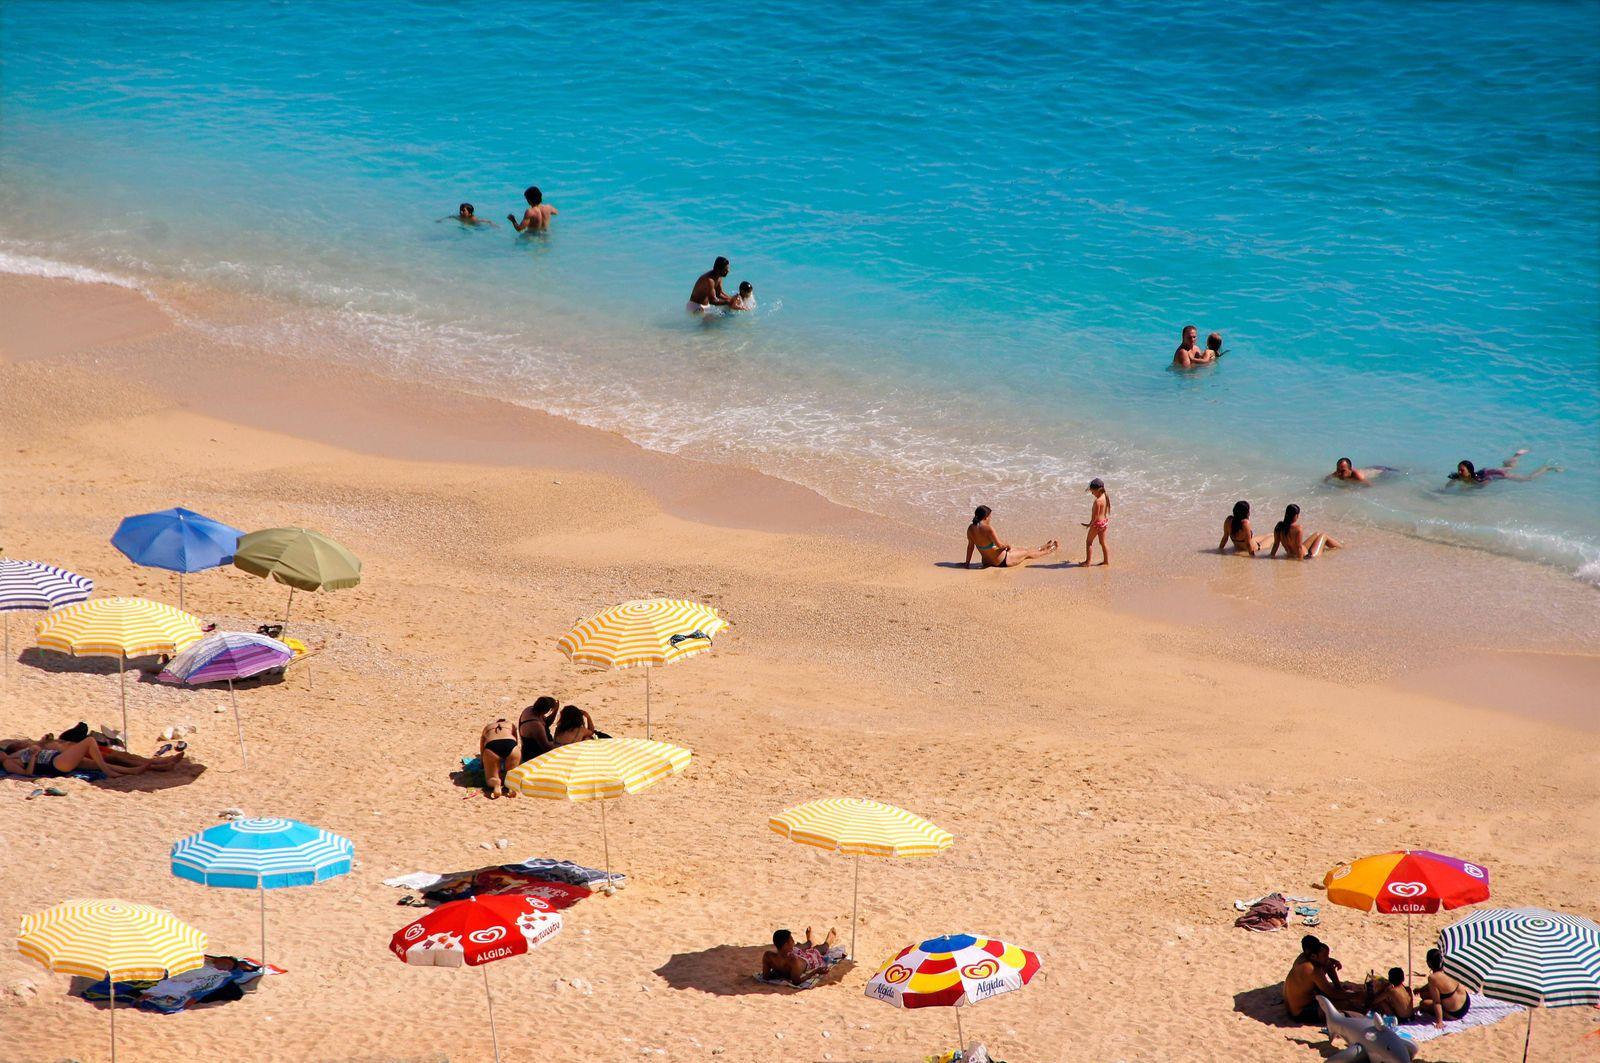 On the Beach near Kas, Turkey. PUBLICATIONxNOTxINxUAExKSAxQATxLIBxKUWxOMAxBRN Copyright: xJDxDallet/arabianEyex JDD6111